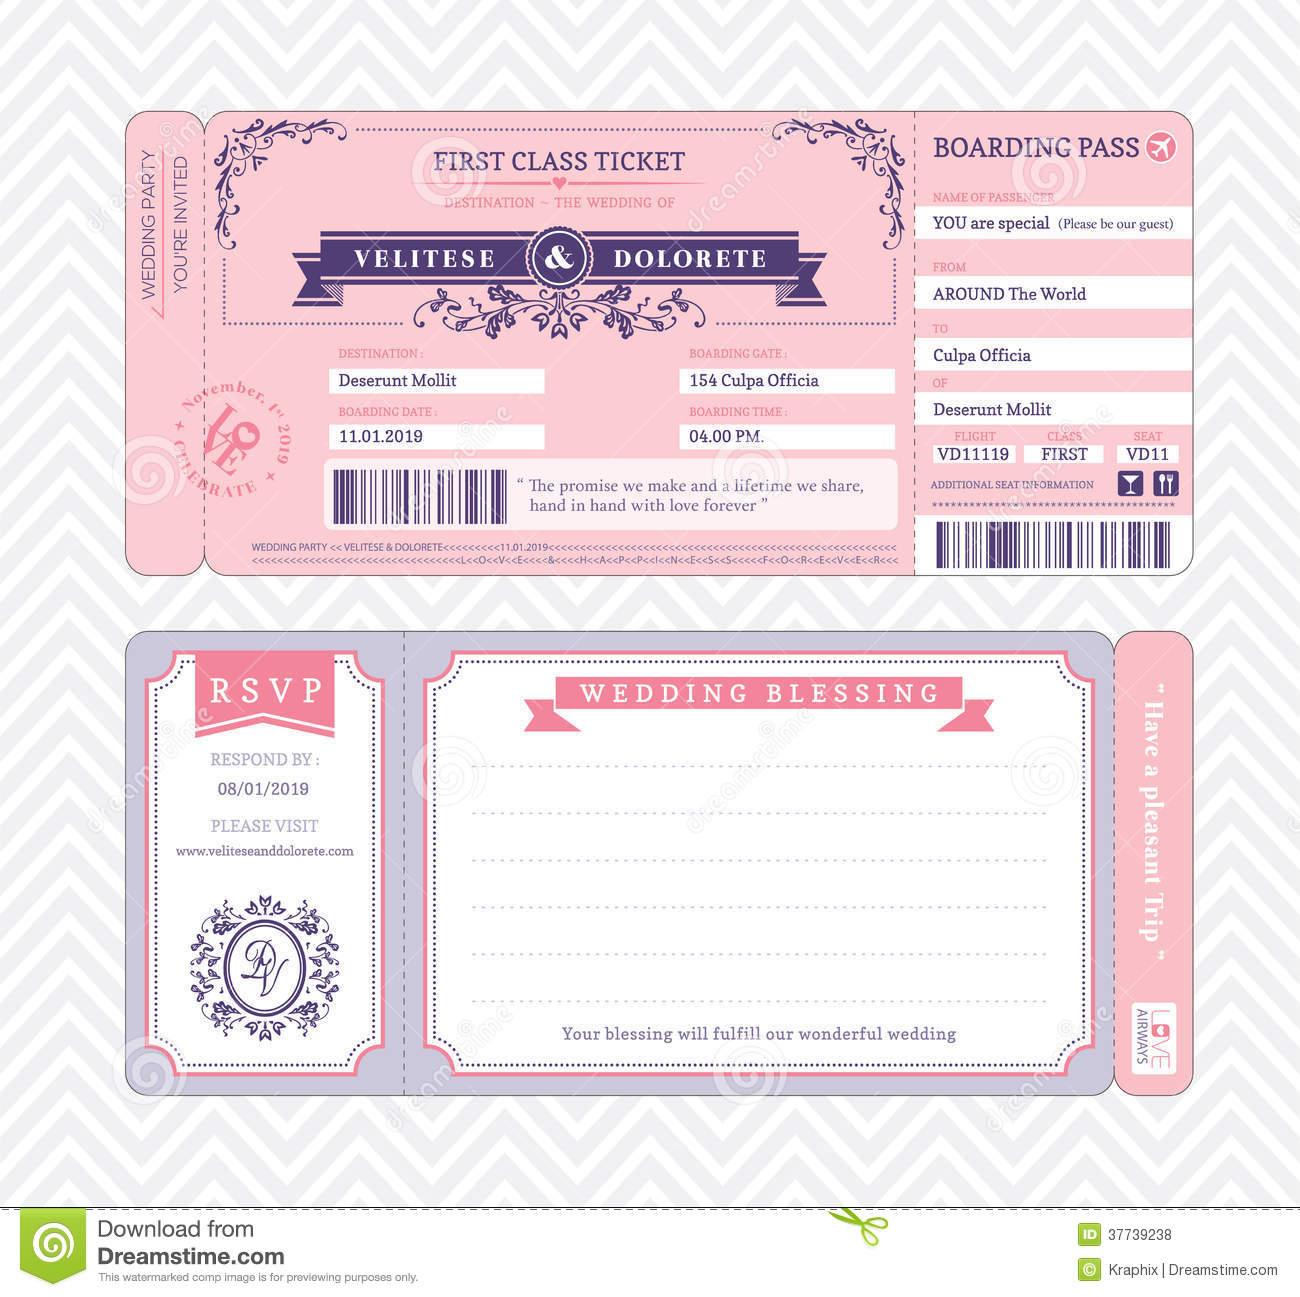 Boarding Pass Wedding Invitation Template Stock Vector - Free Printable Wedding Invitations Templates Downloads